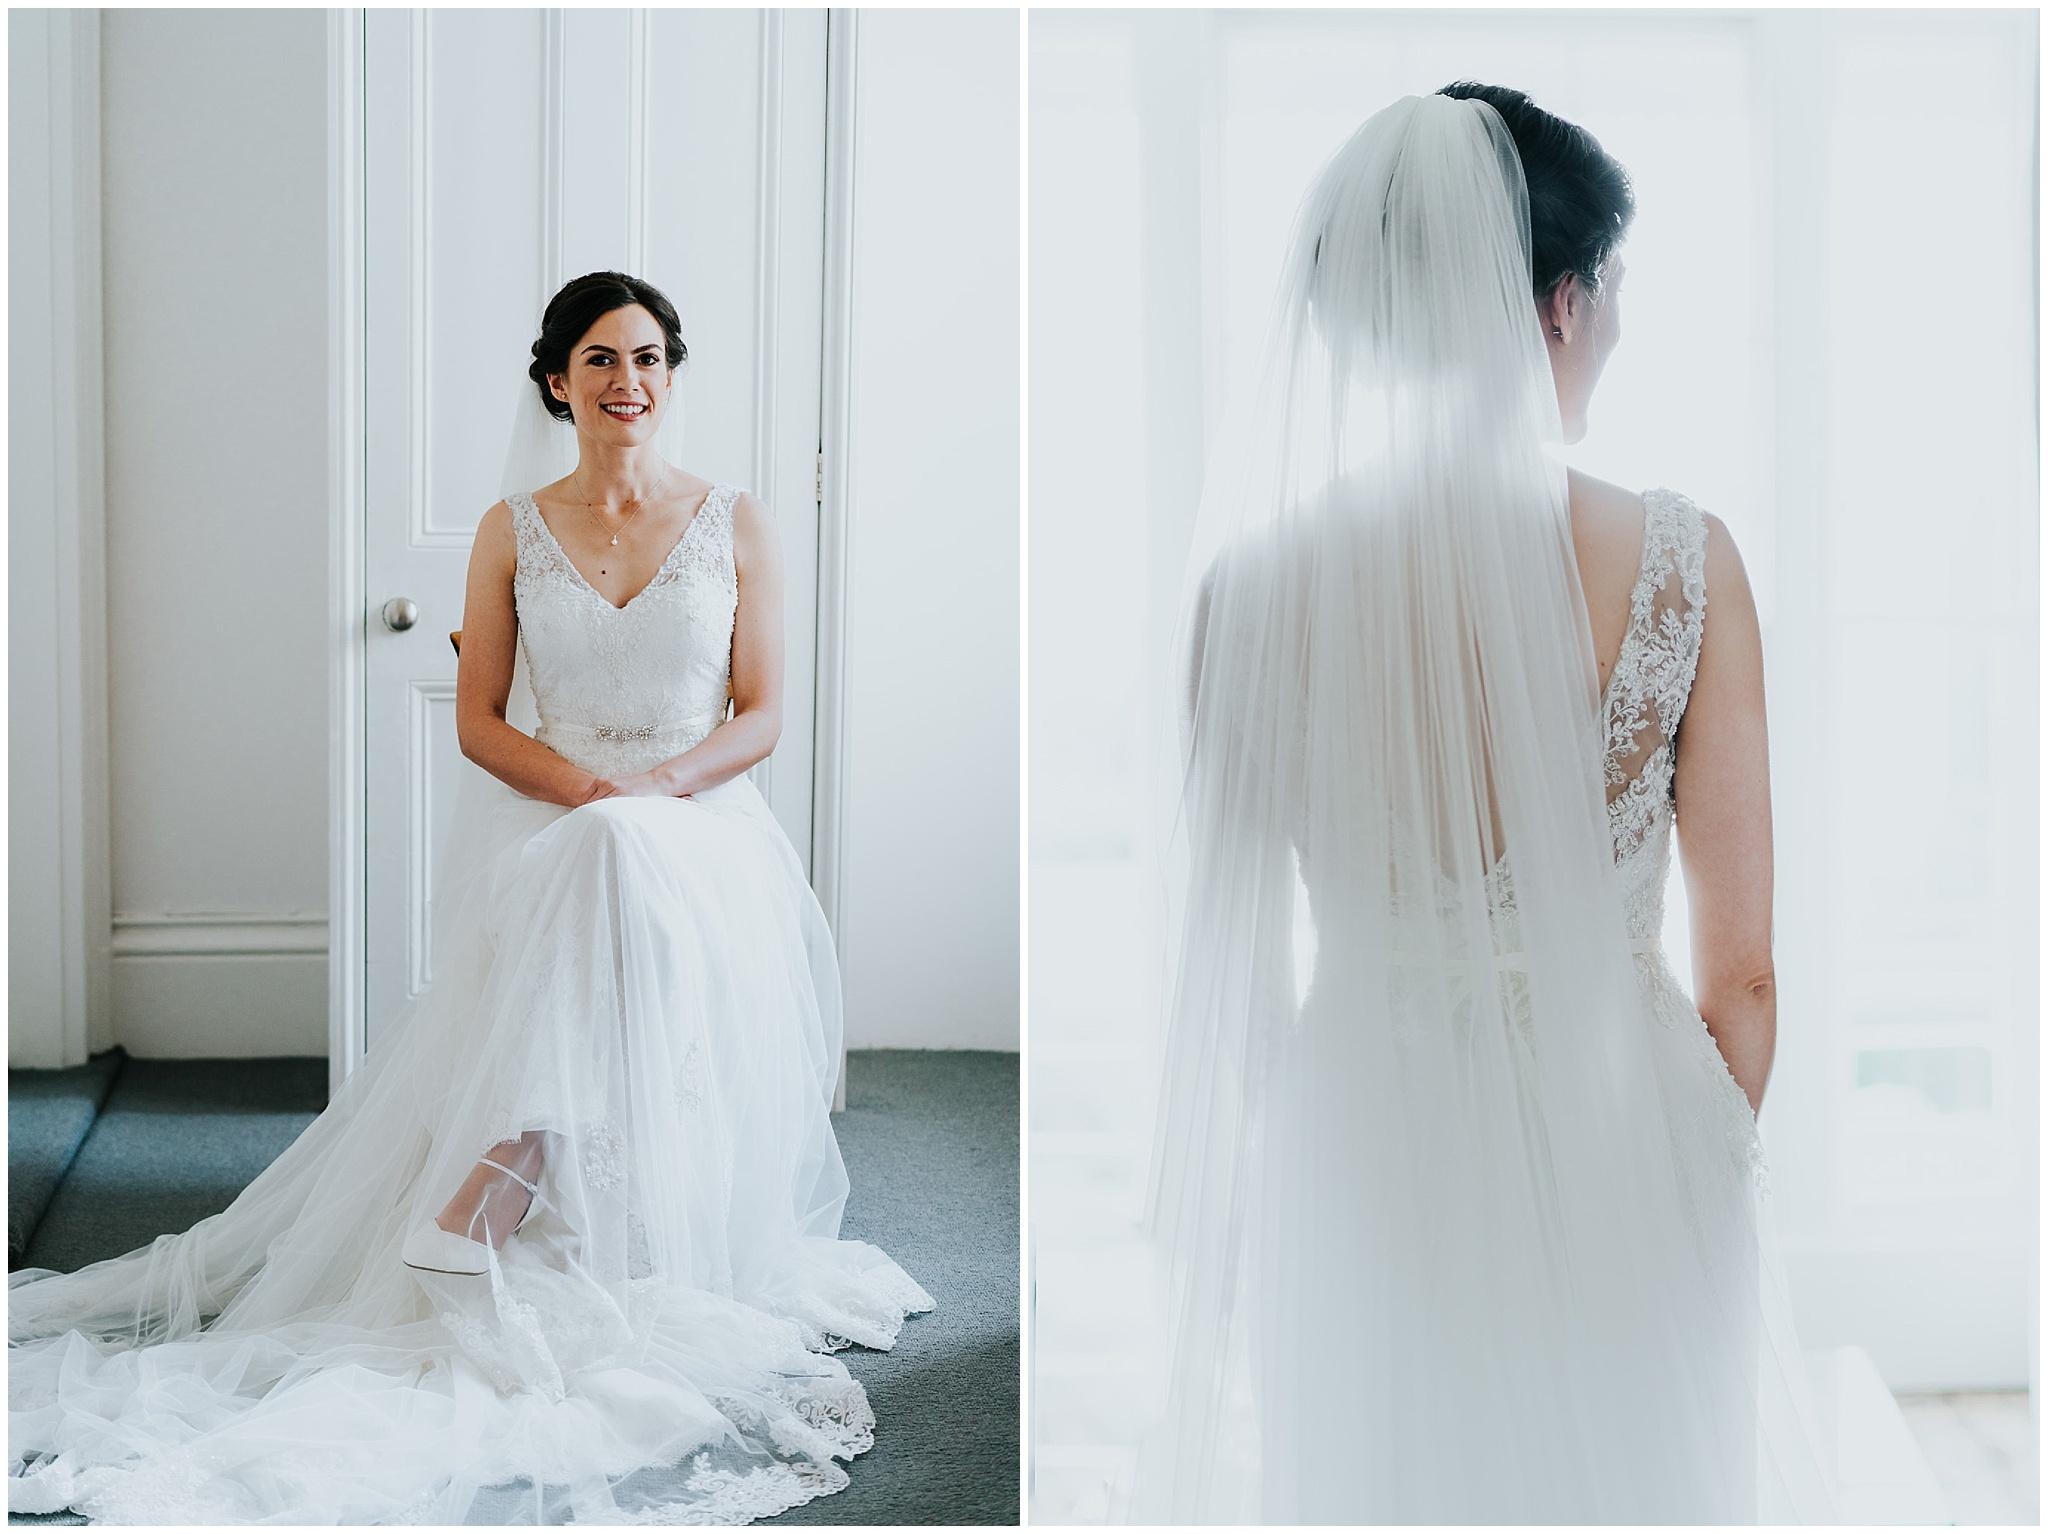 Stanway House Gloucester wedding photography020